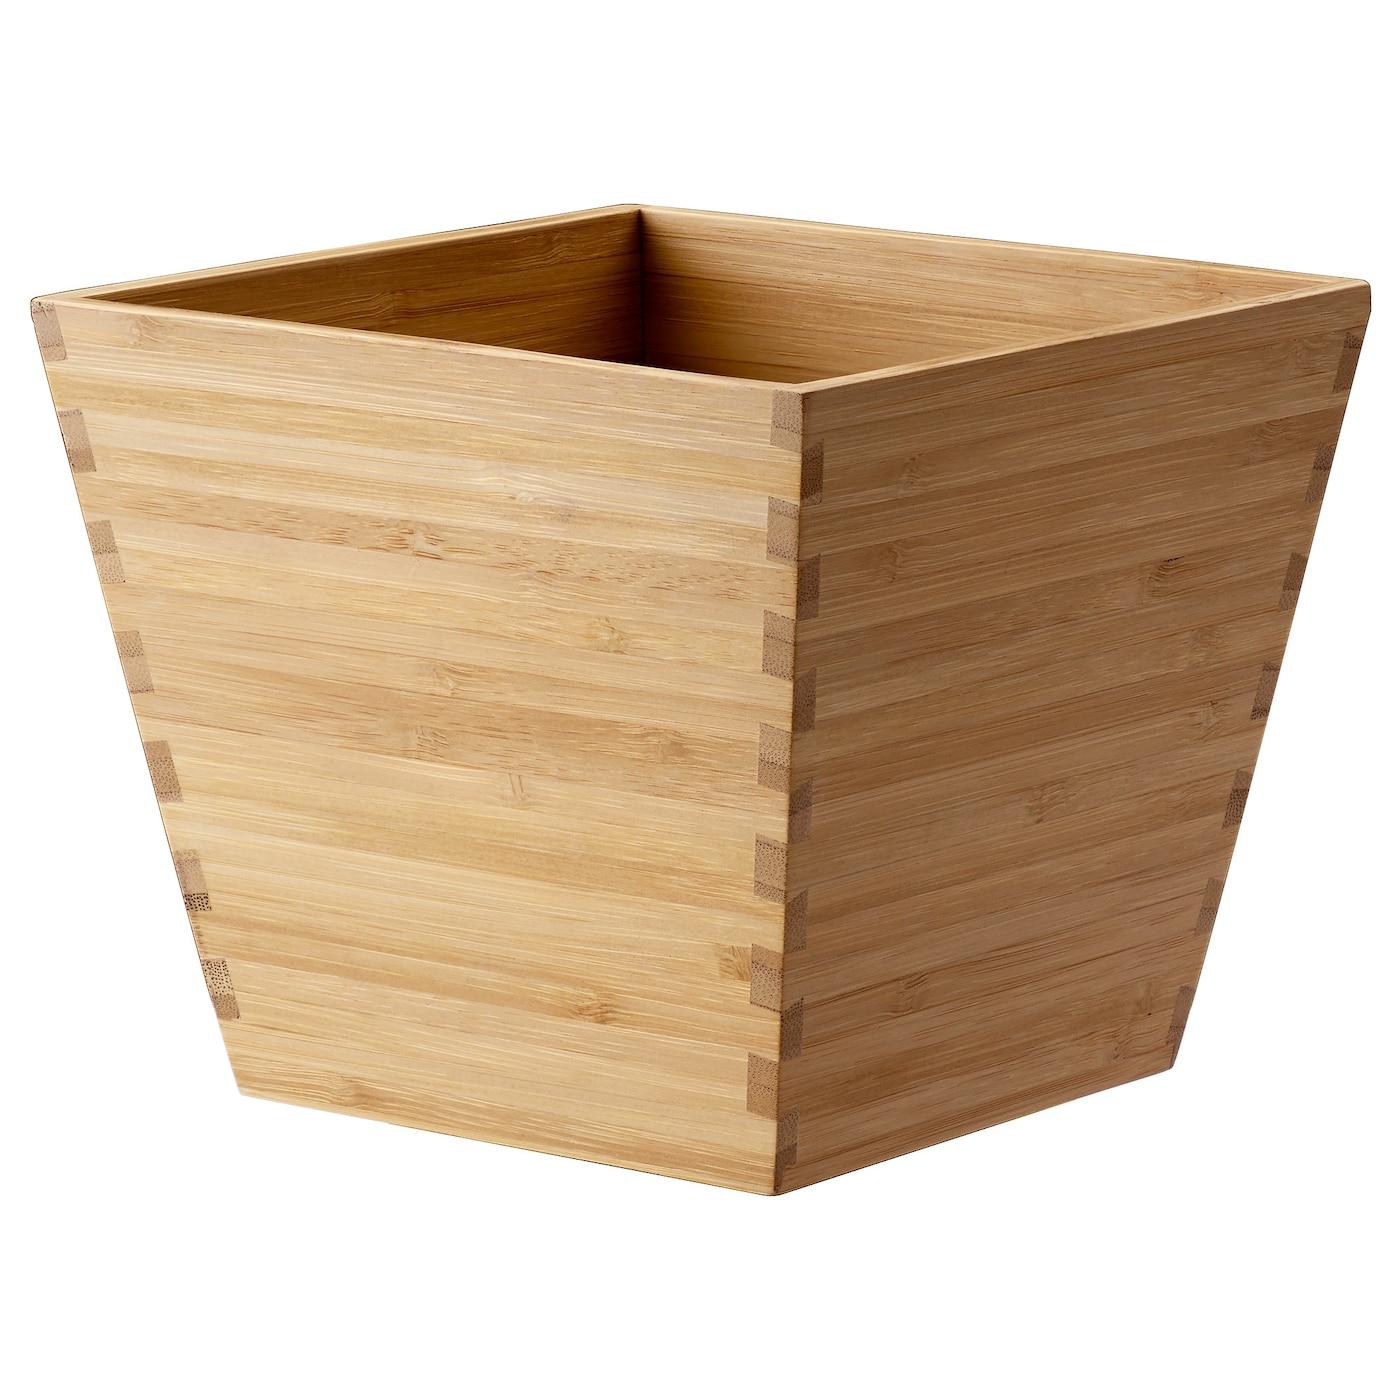 vildapel plant pot bamboo 12 cm ikea. Black Bedroom Furniture Sets. Home Design Ideas